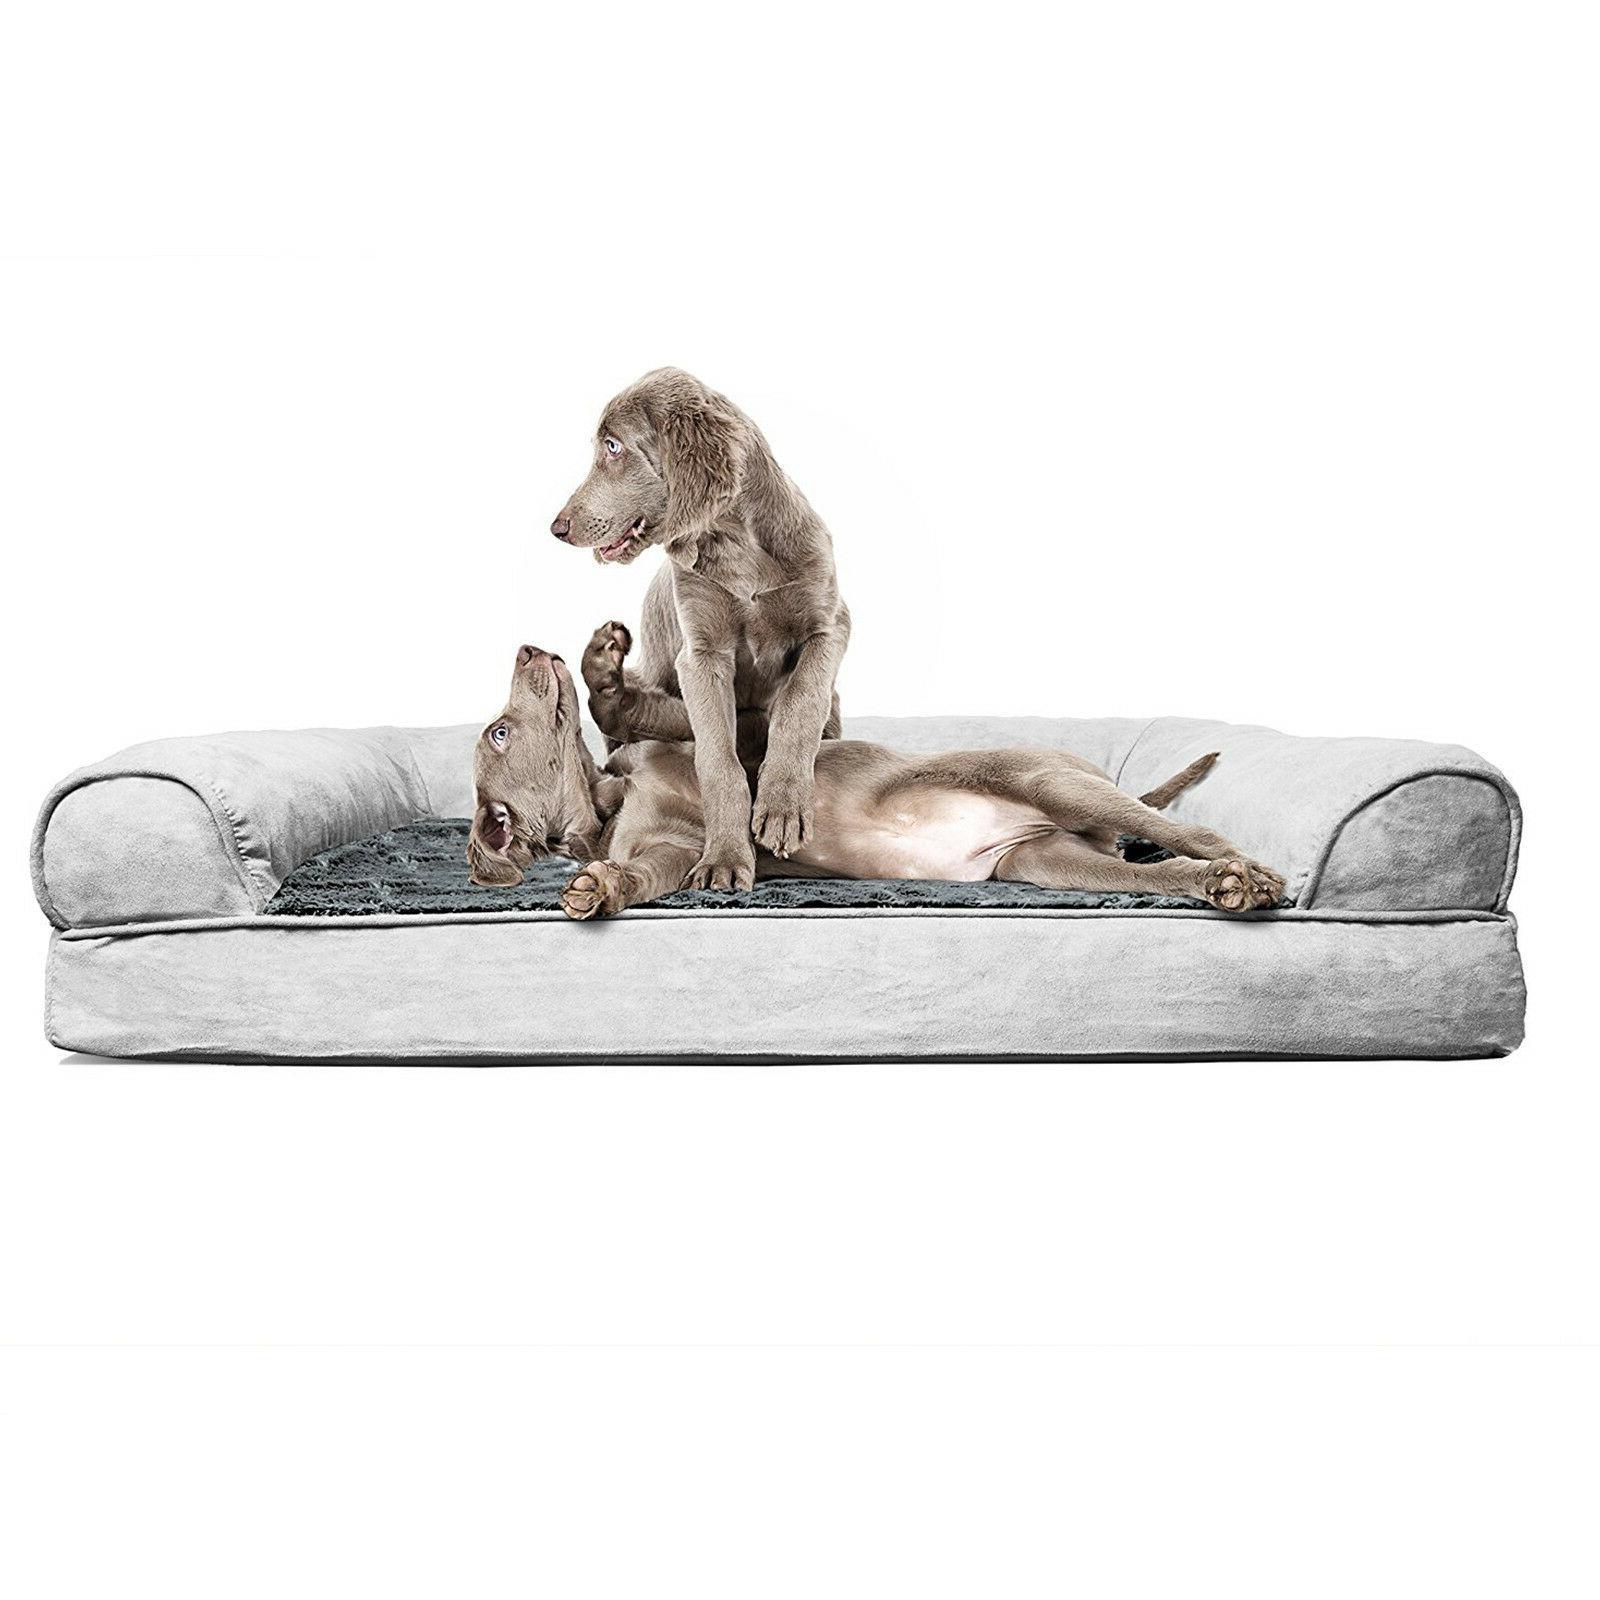 Orthopedic Sofa Foam Pets Large Medium Cushion New